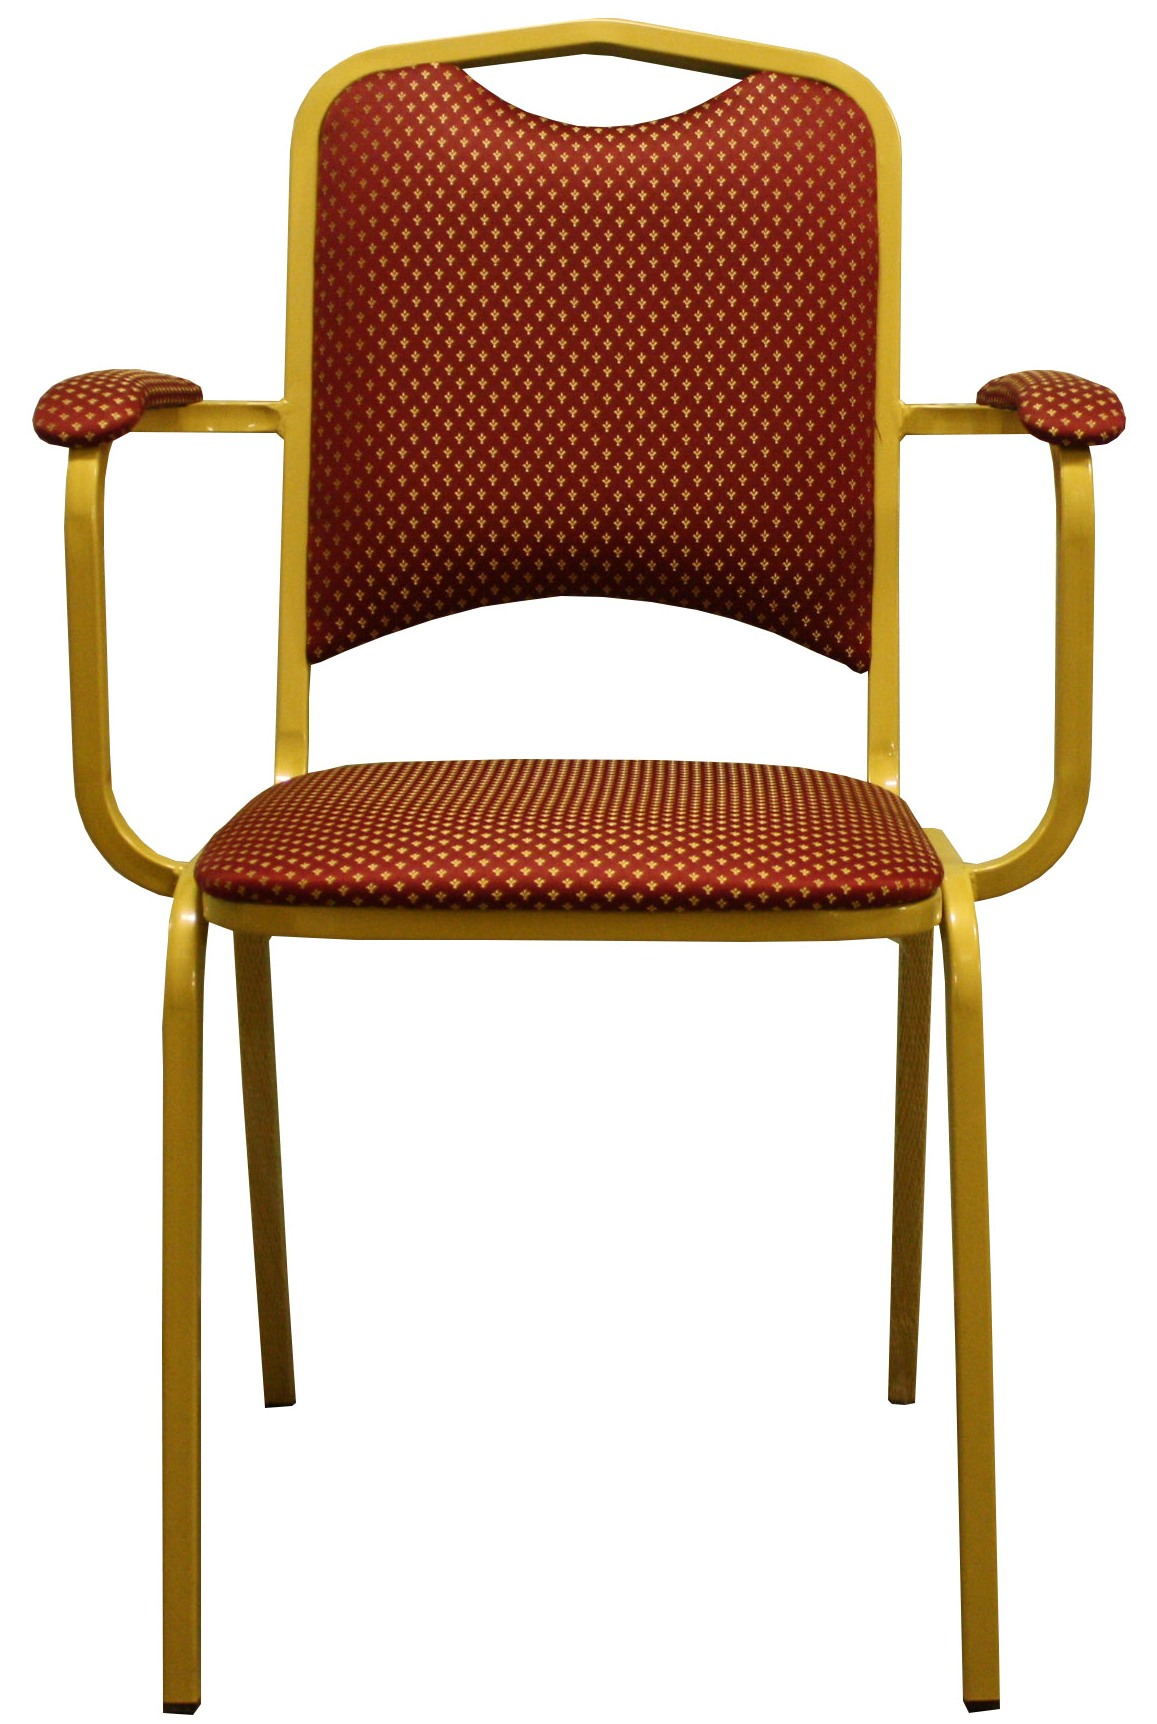 партерный стул (2)